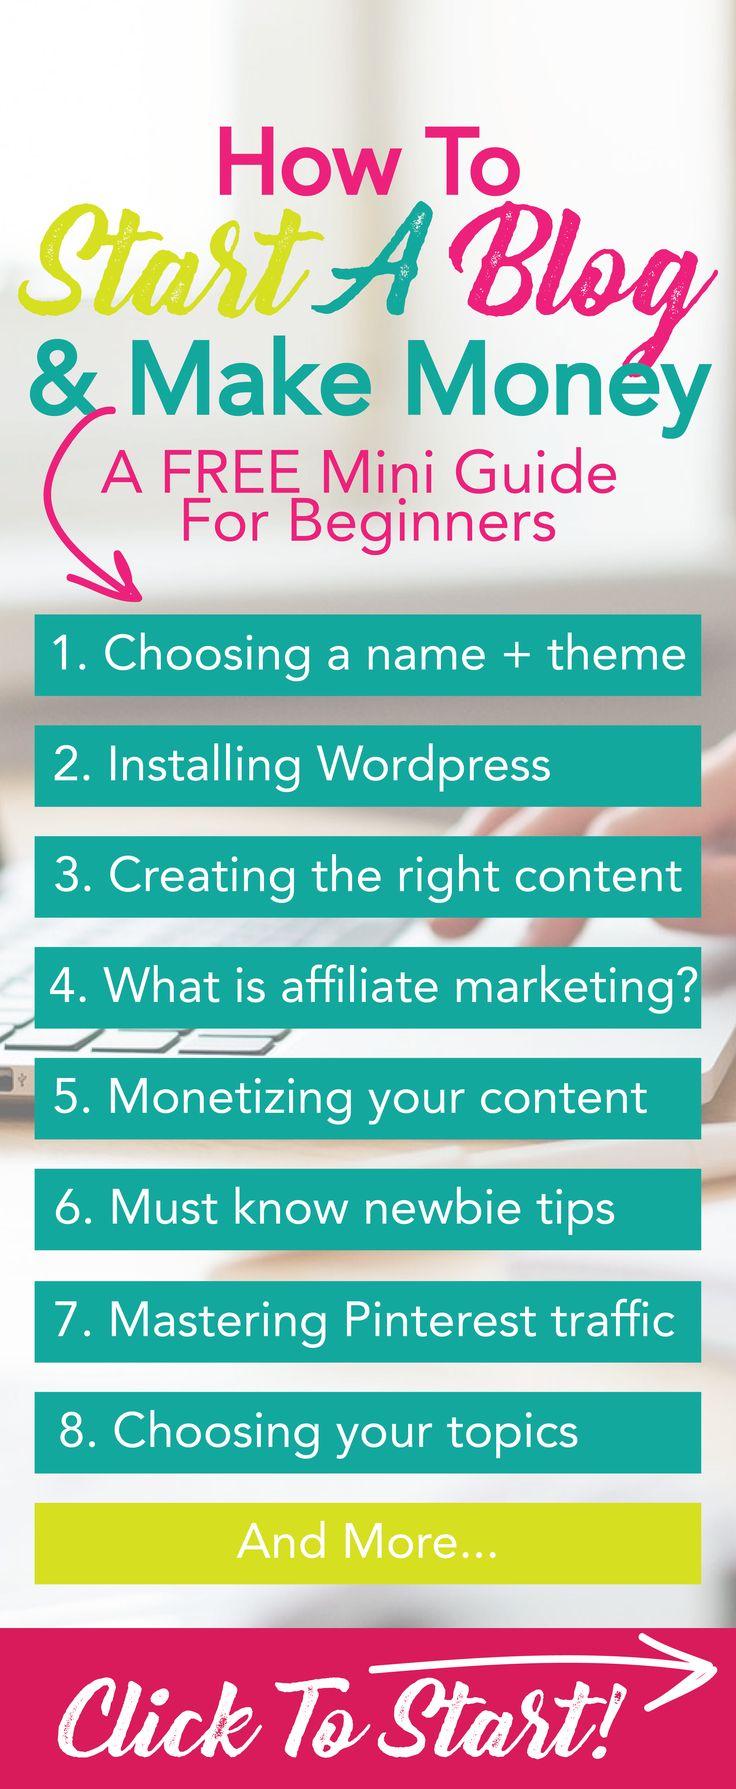 how to start a blog and make money free tutorial | Wordpress for beginners | Mommy Blog | lifestyle blog | Start a blogging business | Pinterest blog traffic | Make money online |